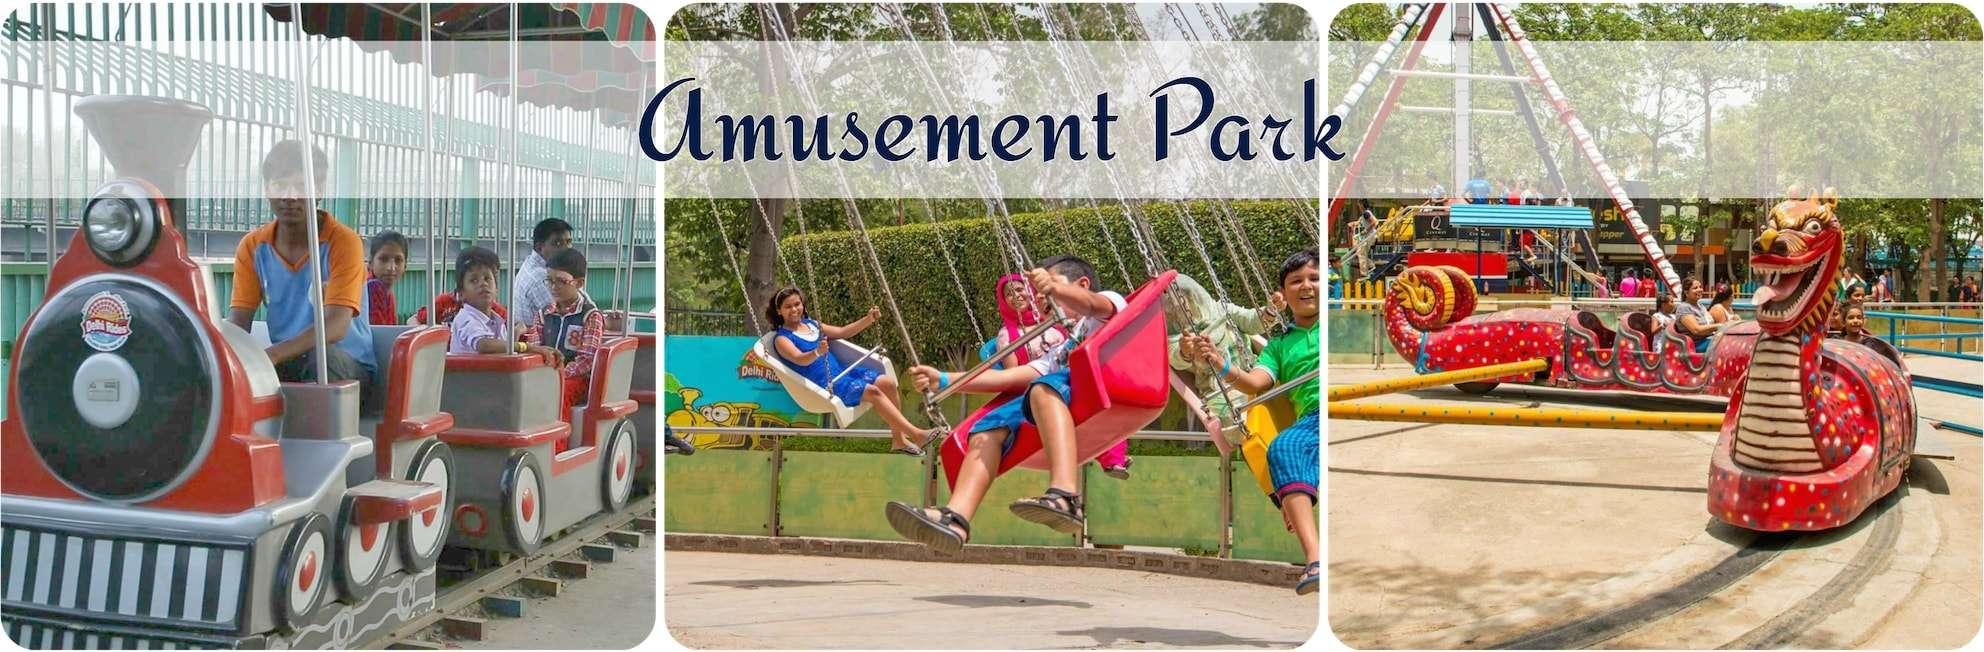 Amusement-park-rides.jpg